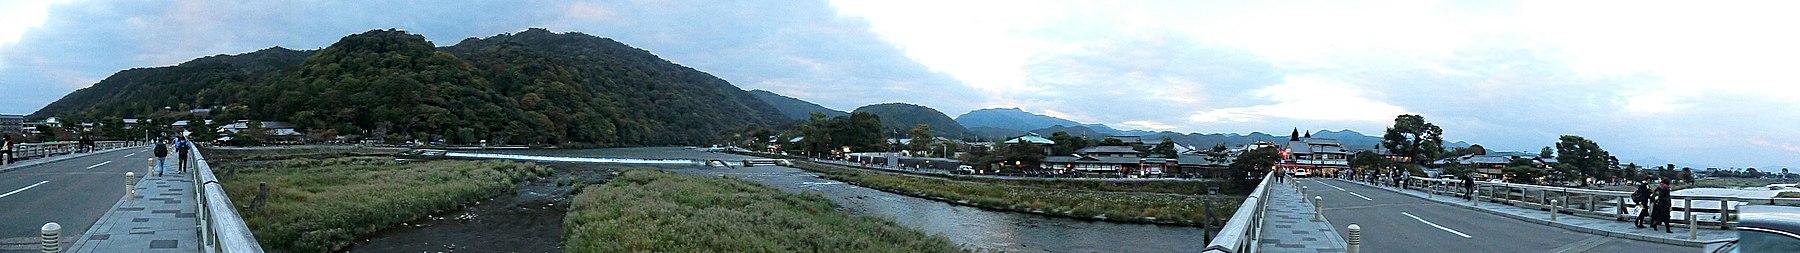 View from TogetsuKyo Bridge 180.JPG